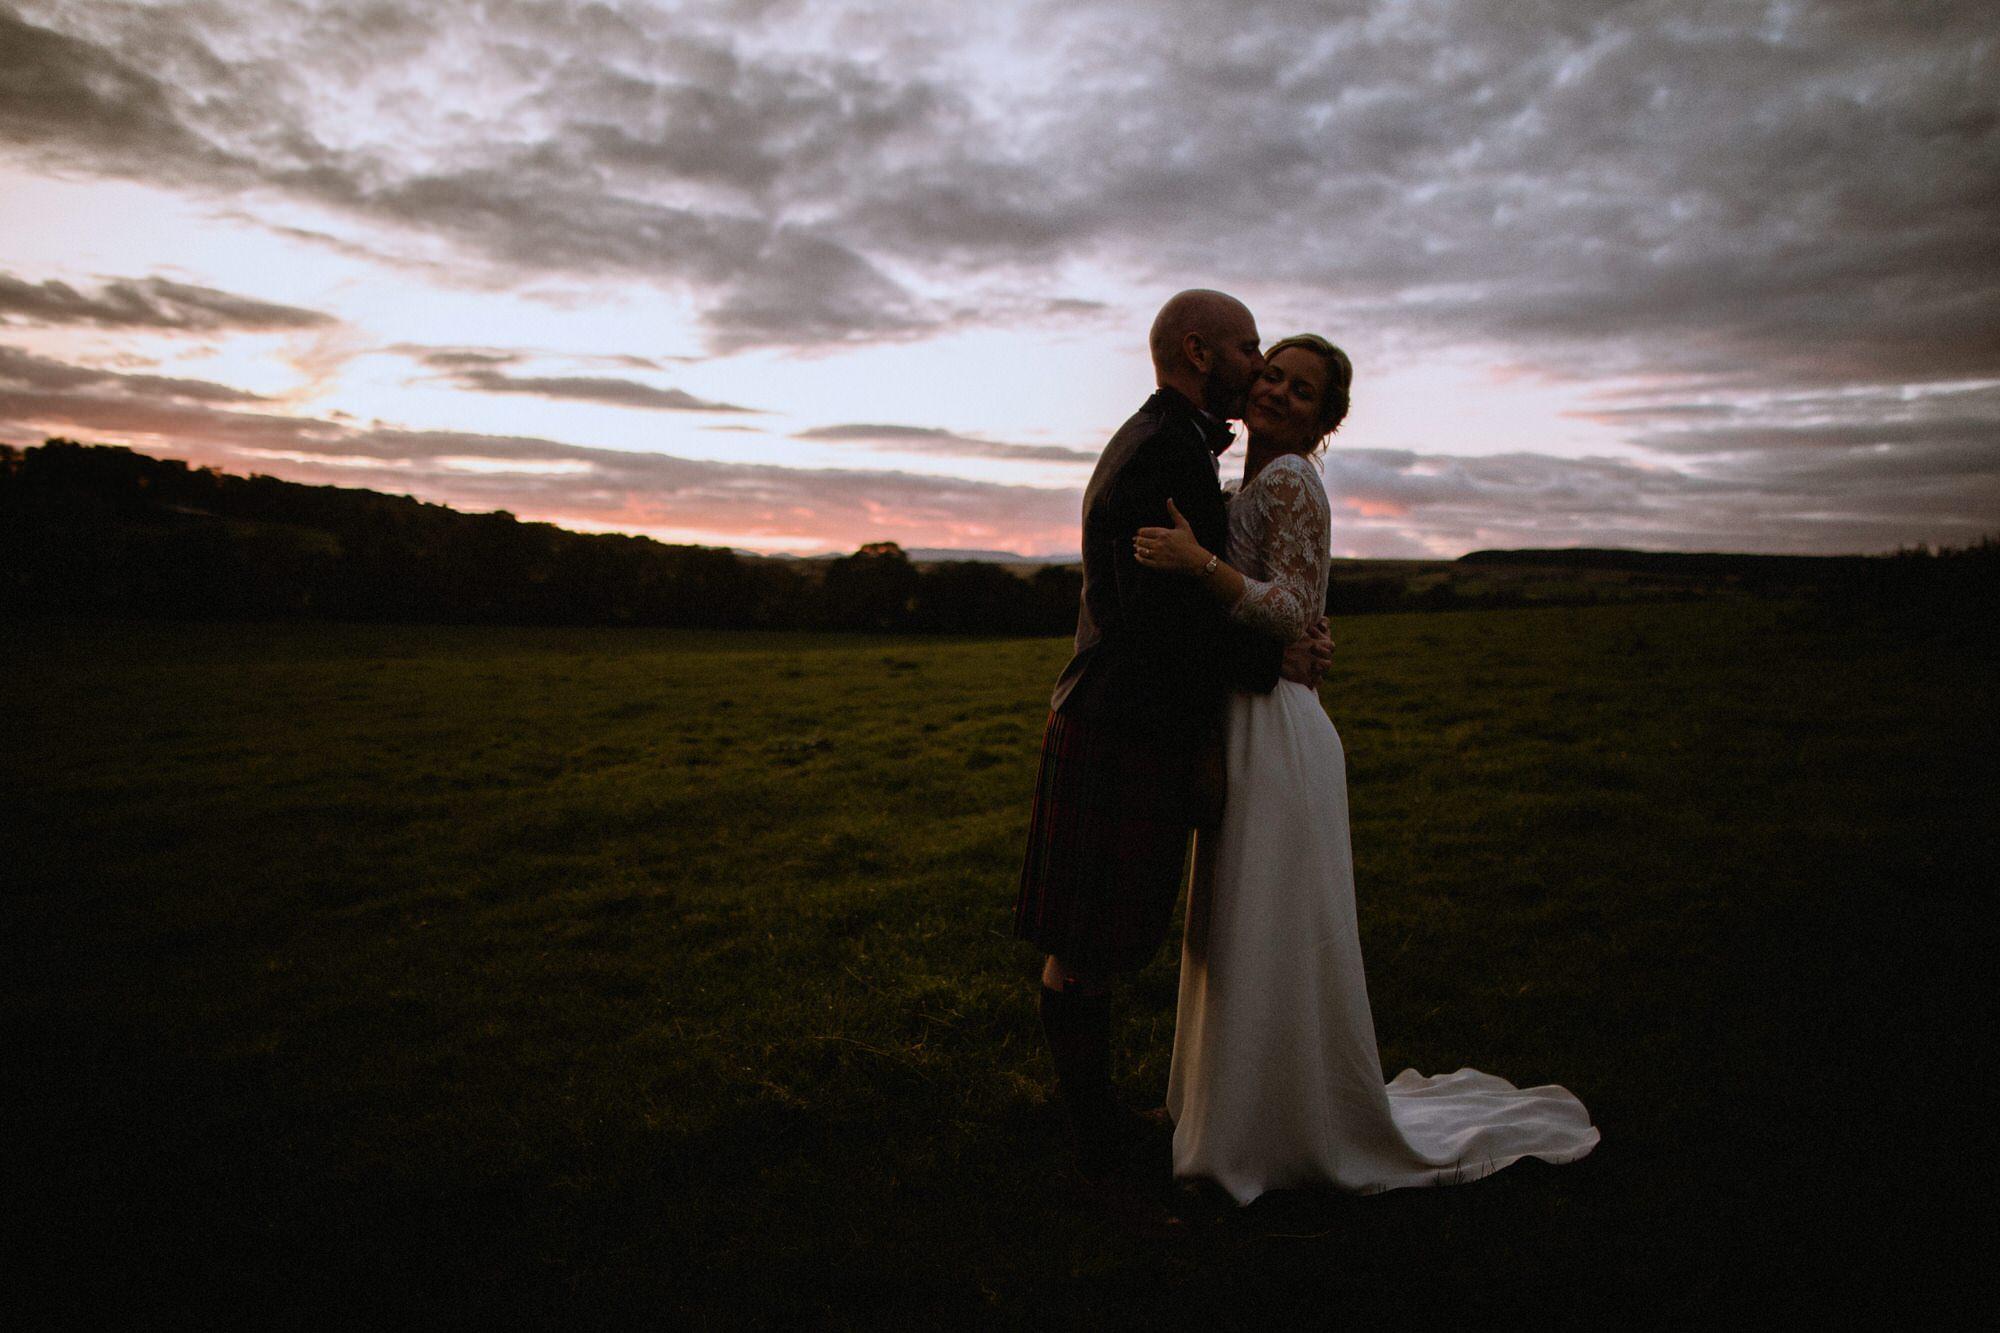 065 STIRLINGSHIRE SUNSET FINTRY GOLDEN HOUR TIN SHED KNOCKRAICH WEDDING AUTUMN ZOE ALEXANDRA PHOTOGRAPHY